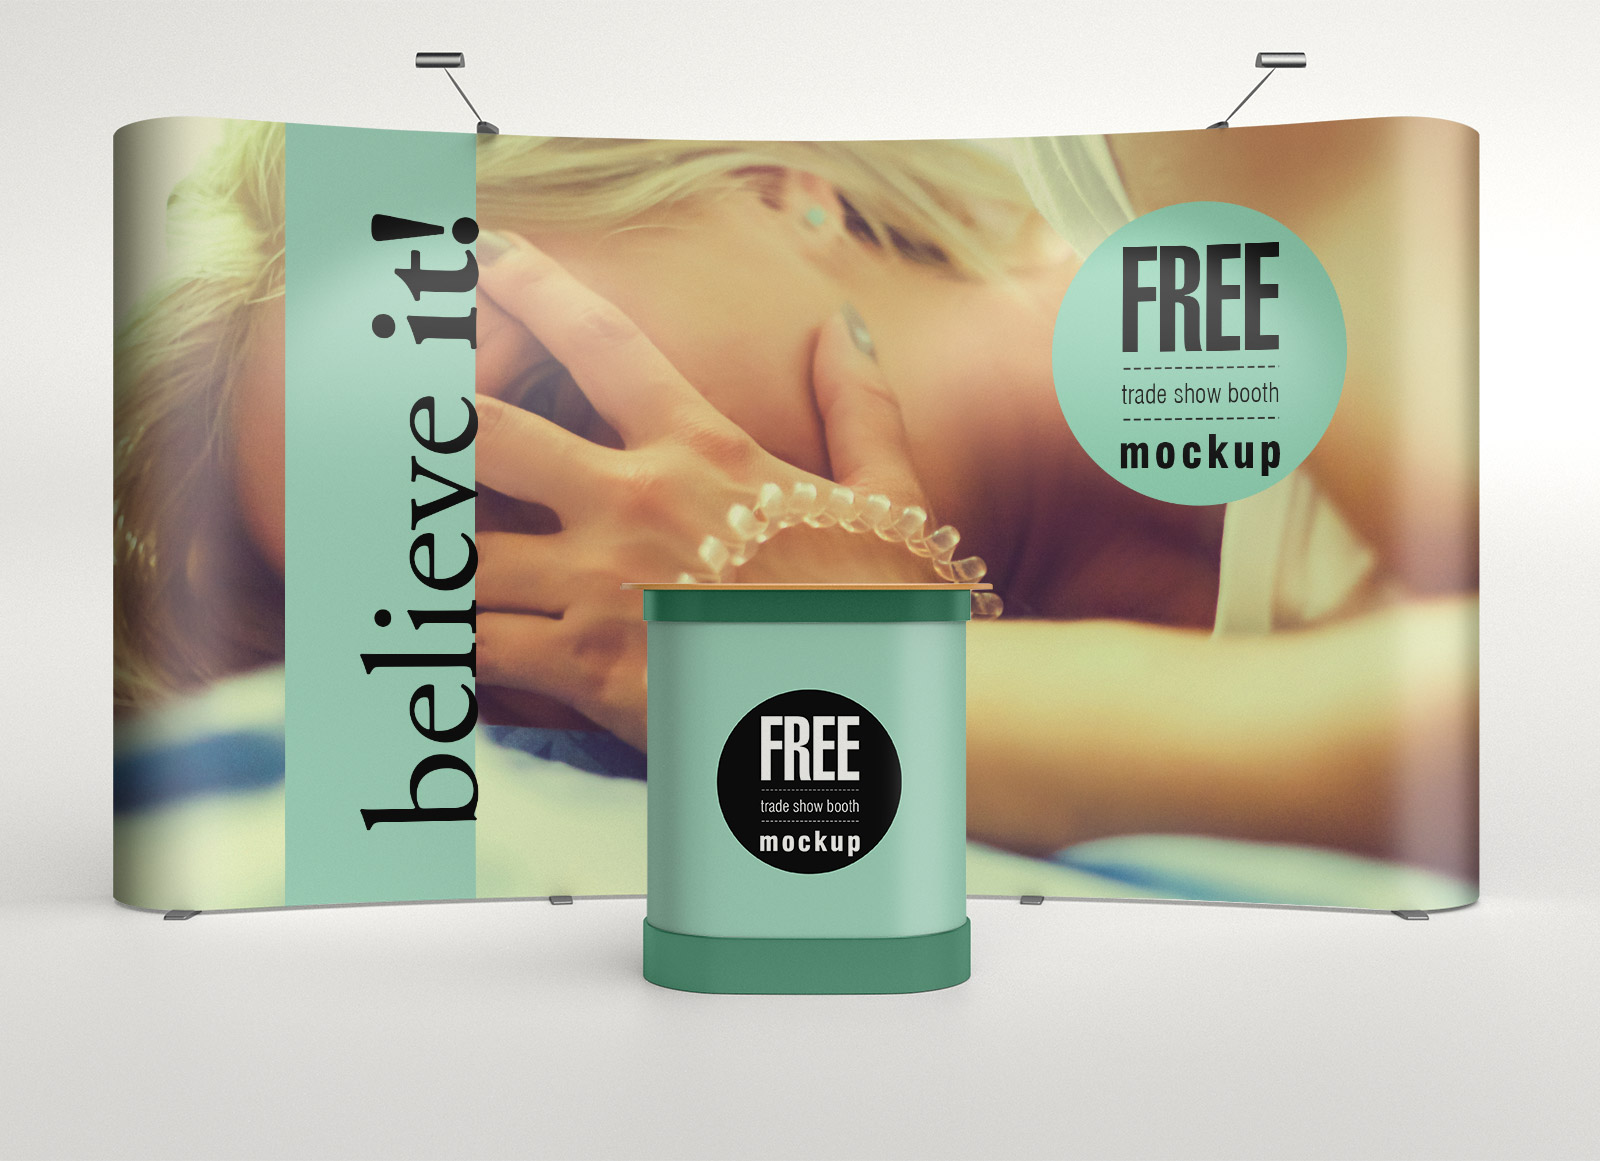 Free-Premium-Trade-Show-Booth-Mockup-PSD